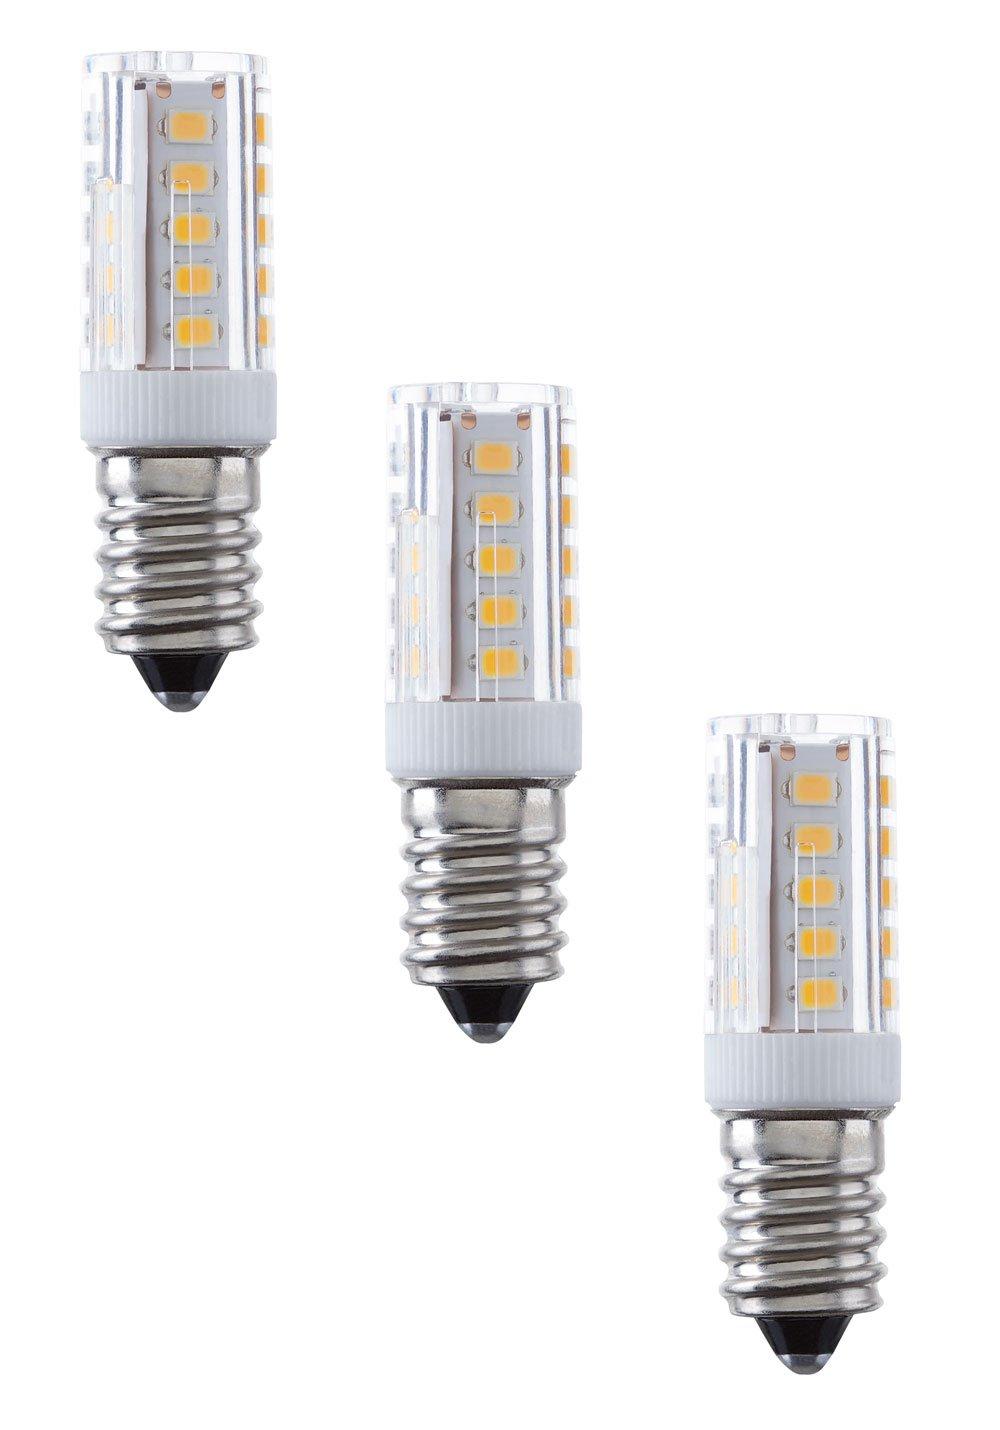 3er Pack NuLoXx LED Spezial Keramik 7W 840 4000K 500lm neutralweiß E14 360°